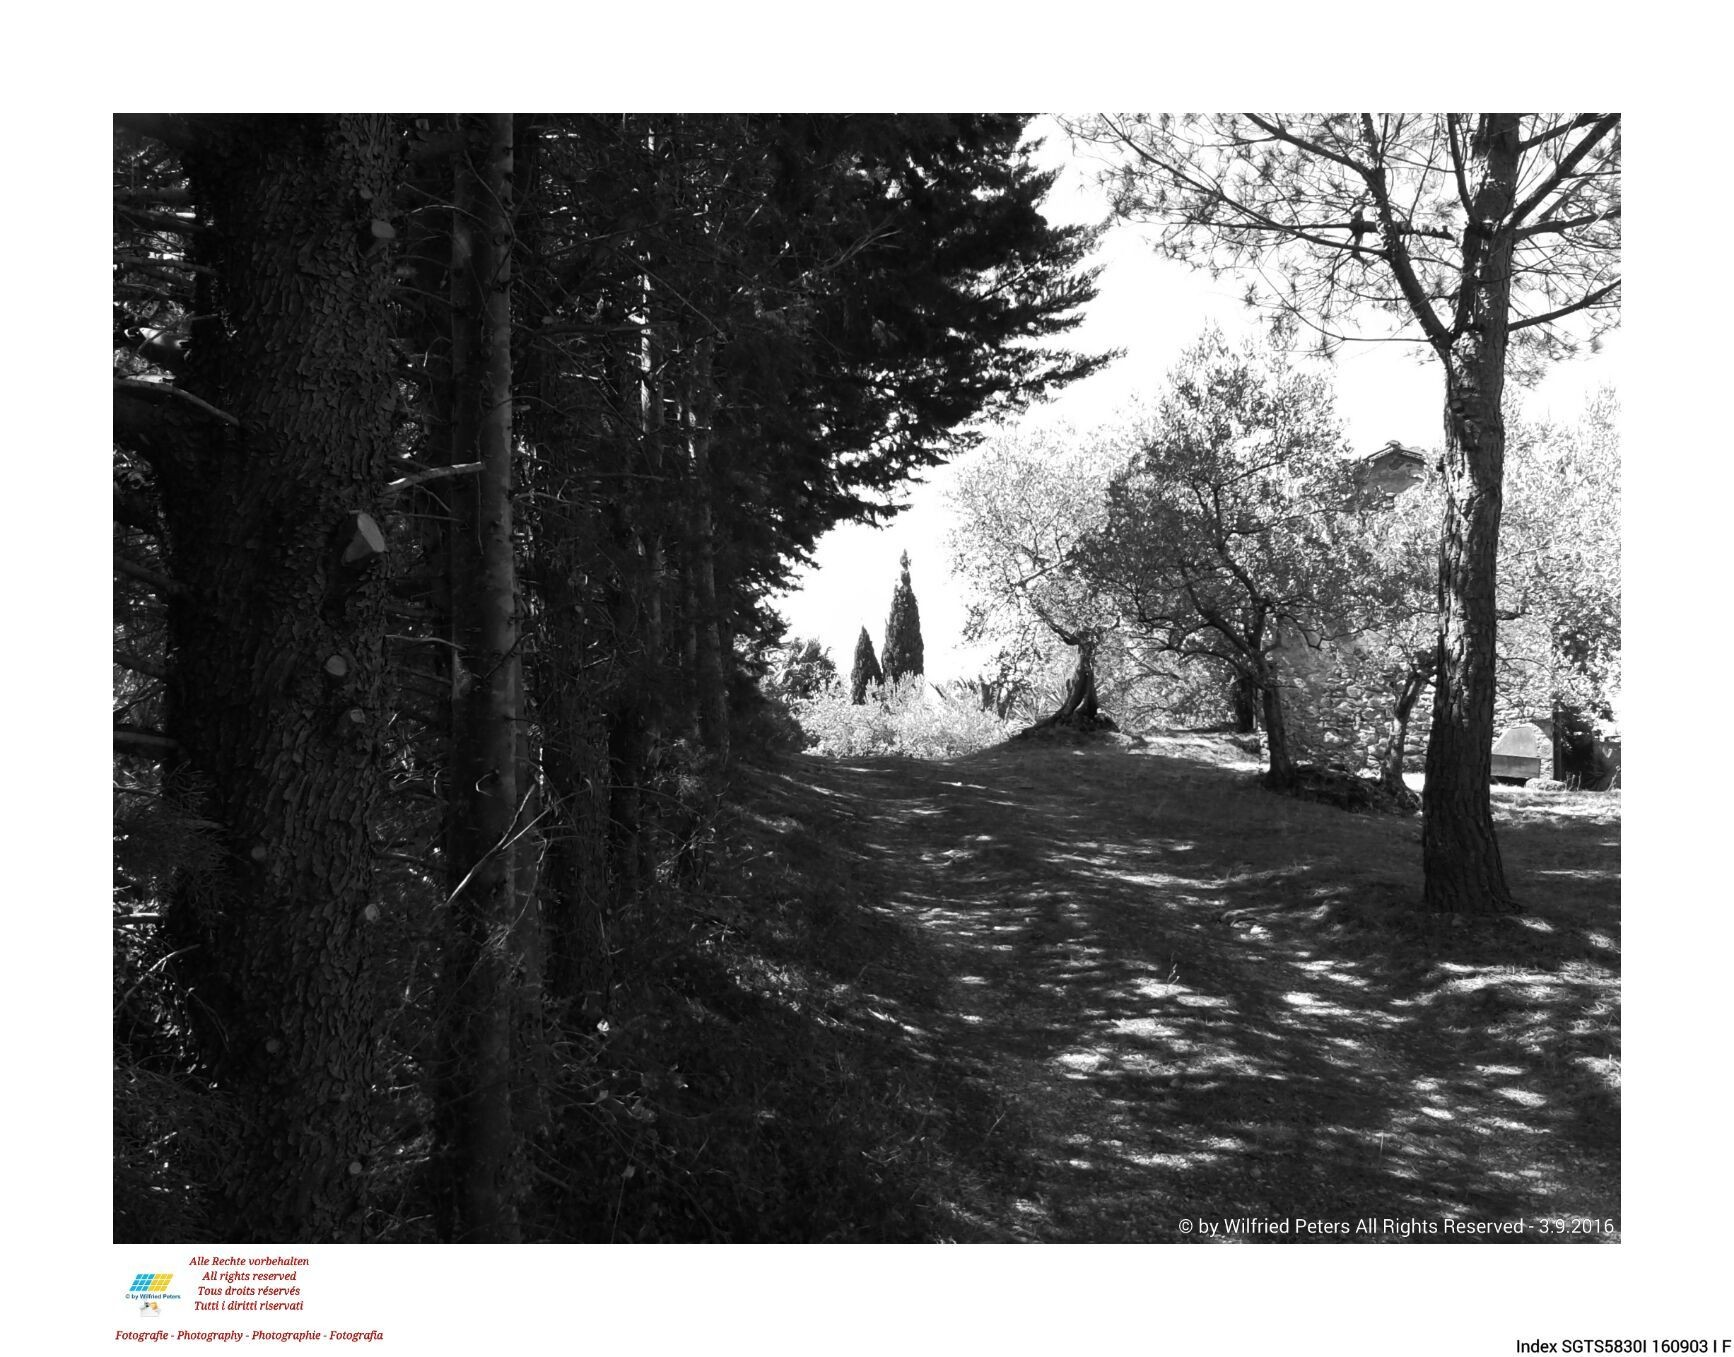 #Fotografie #Photography #Photography #Fotografie #schwarzweiss #blackandwhite #noiretblanc #biancoenero #Italien #Italy #Italie #Italia